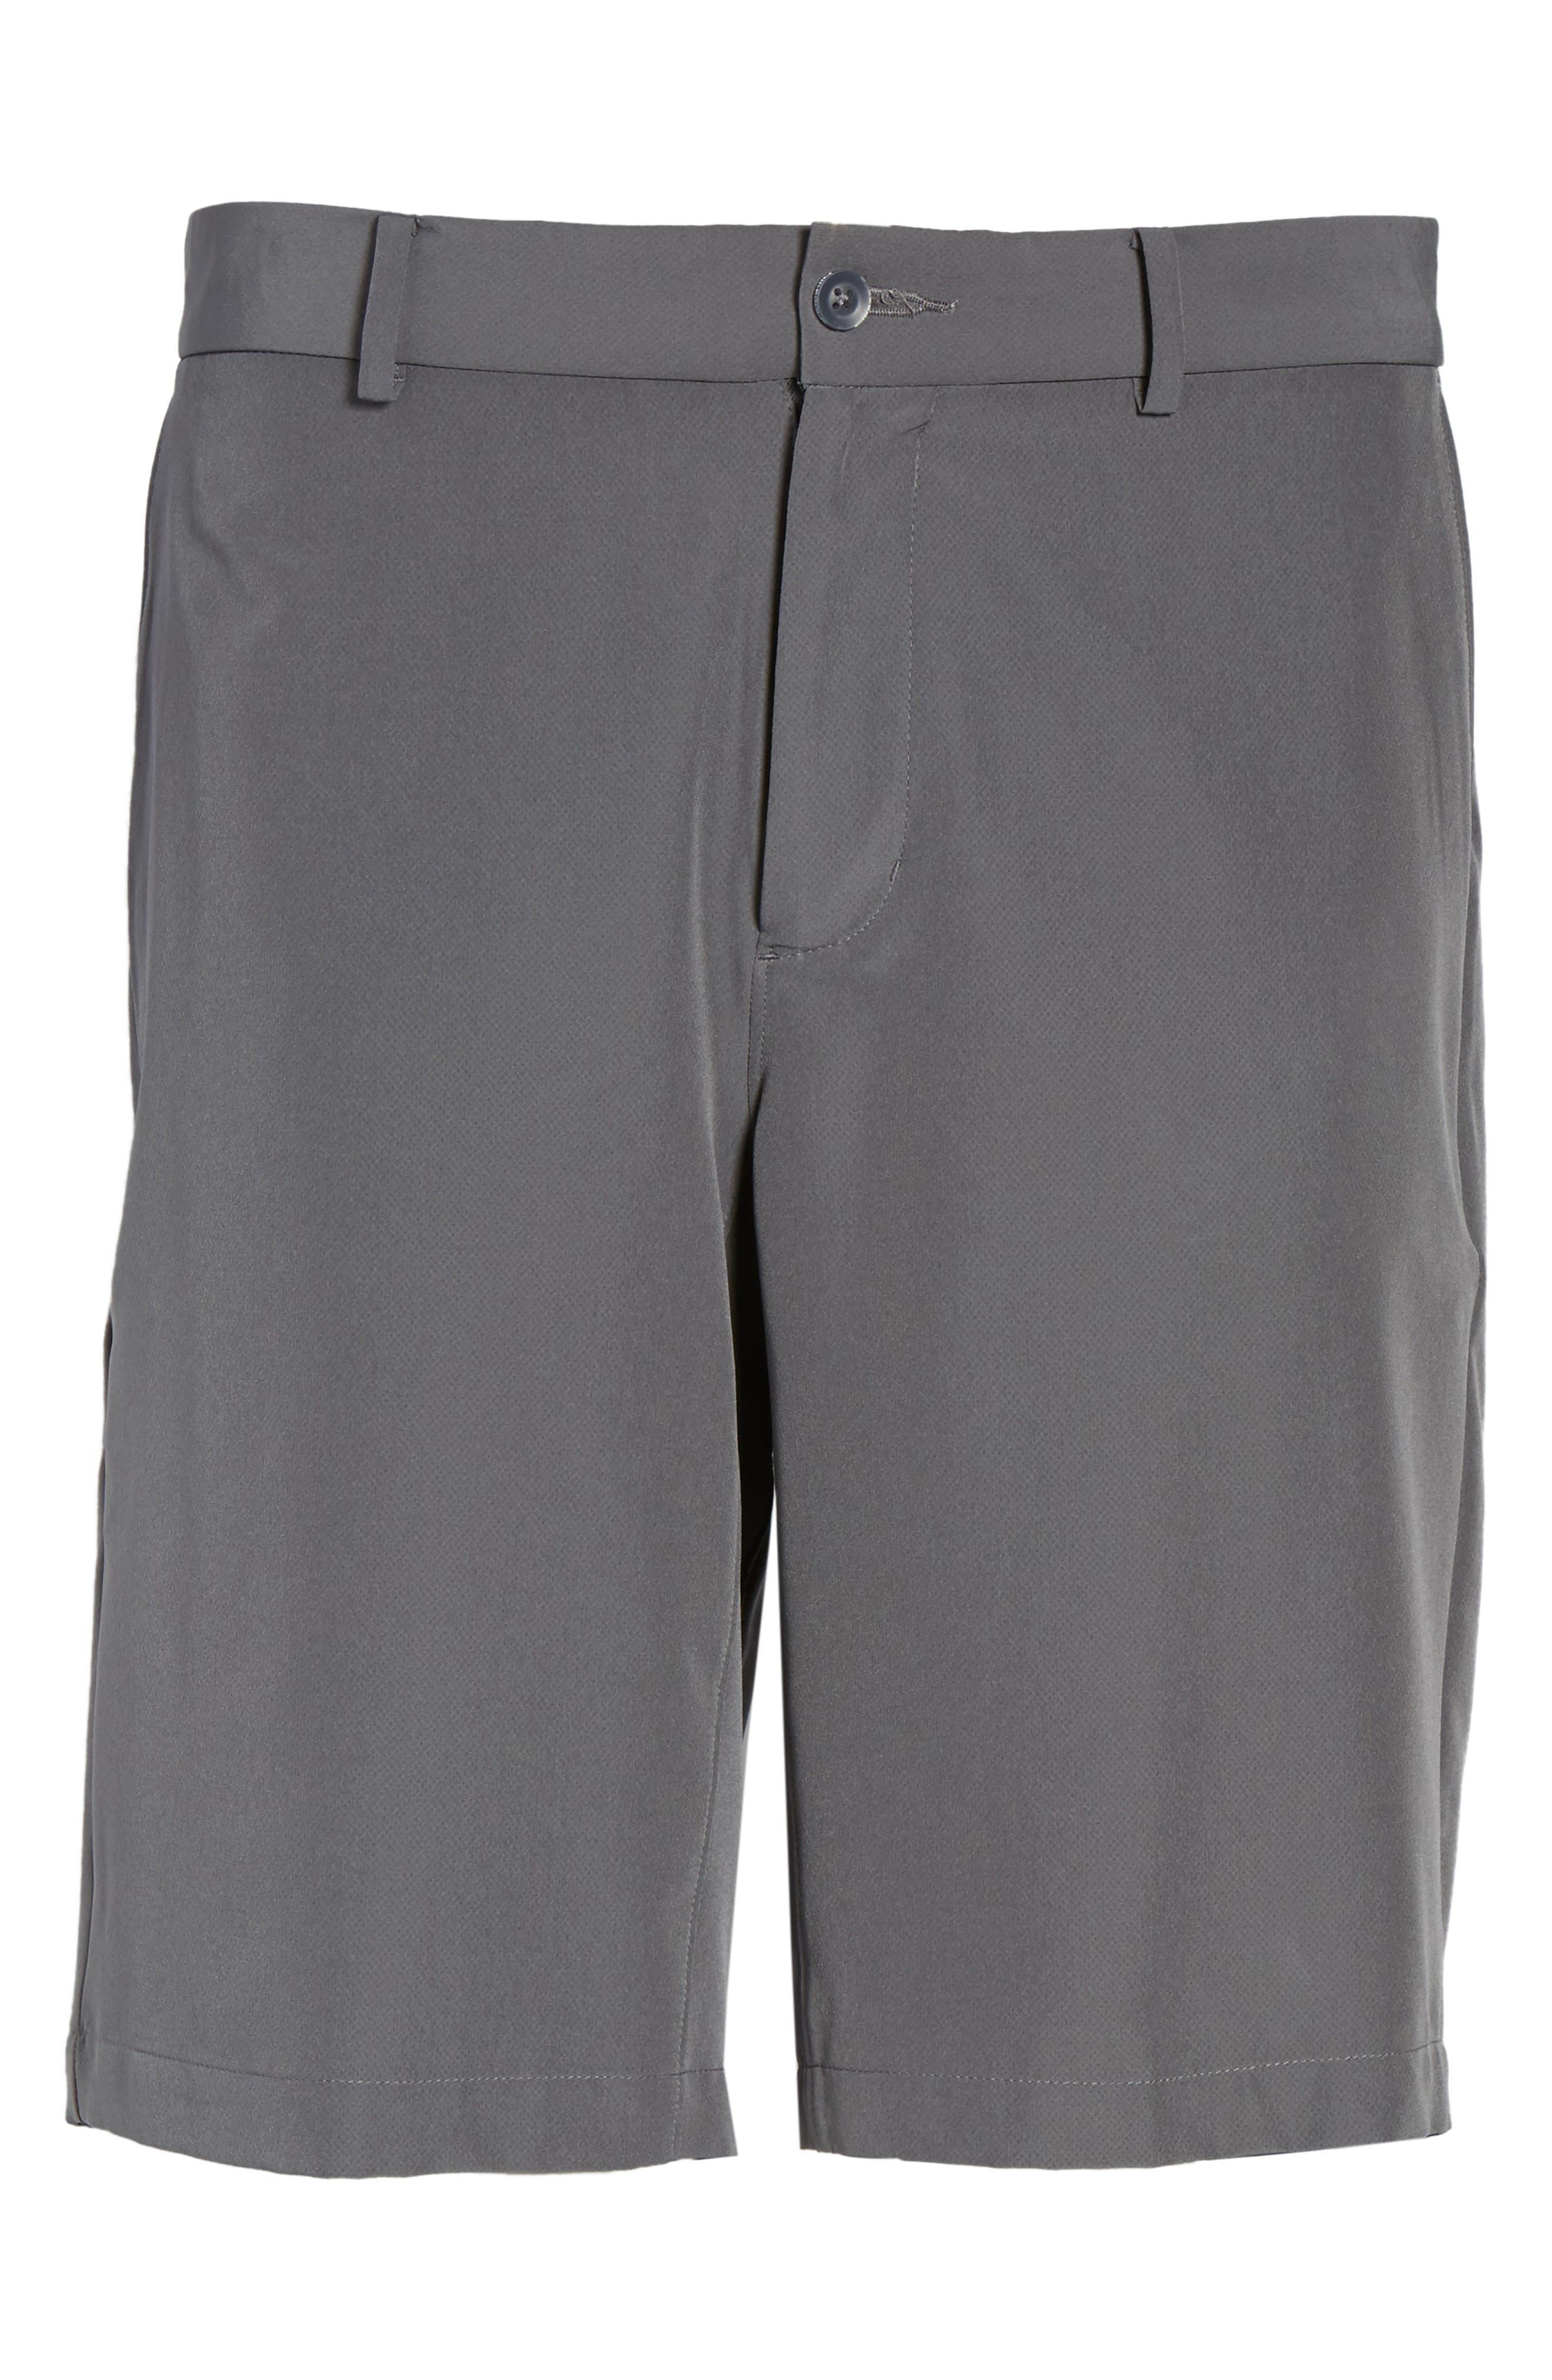 Hybrid Flex Golf Shorts,                             Alternate thumbnail 5, color,                             Dark Grey/ Black